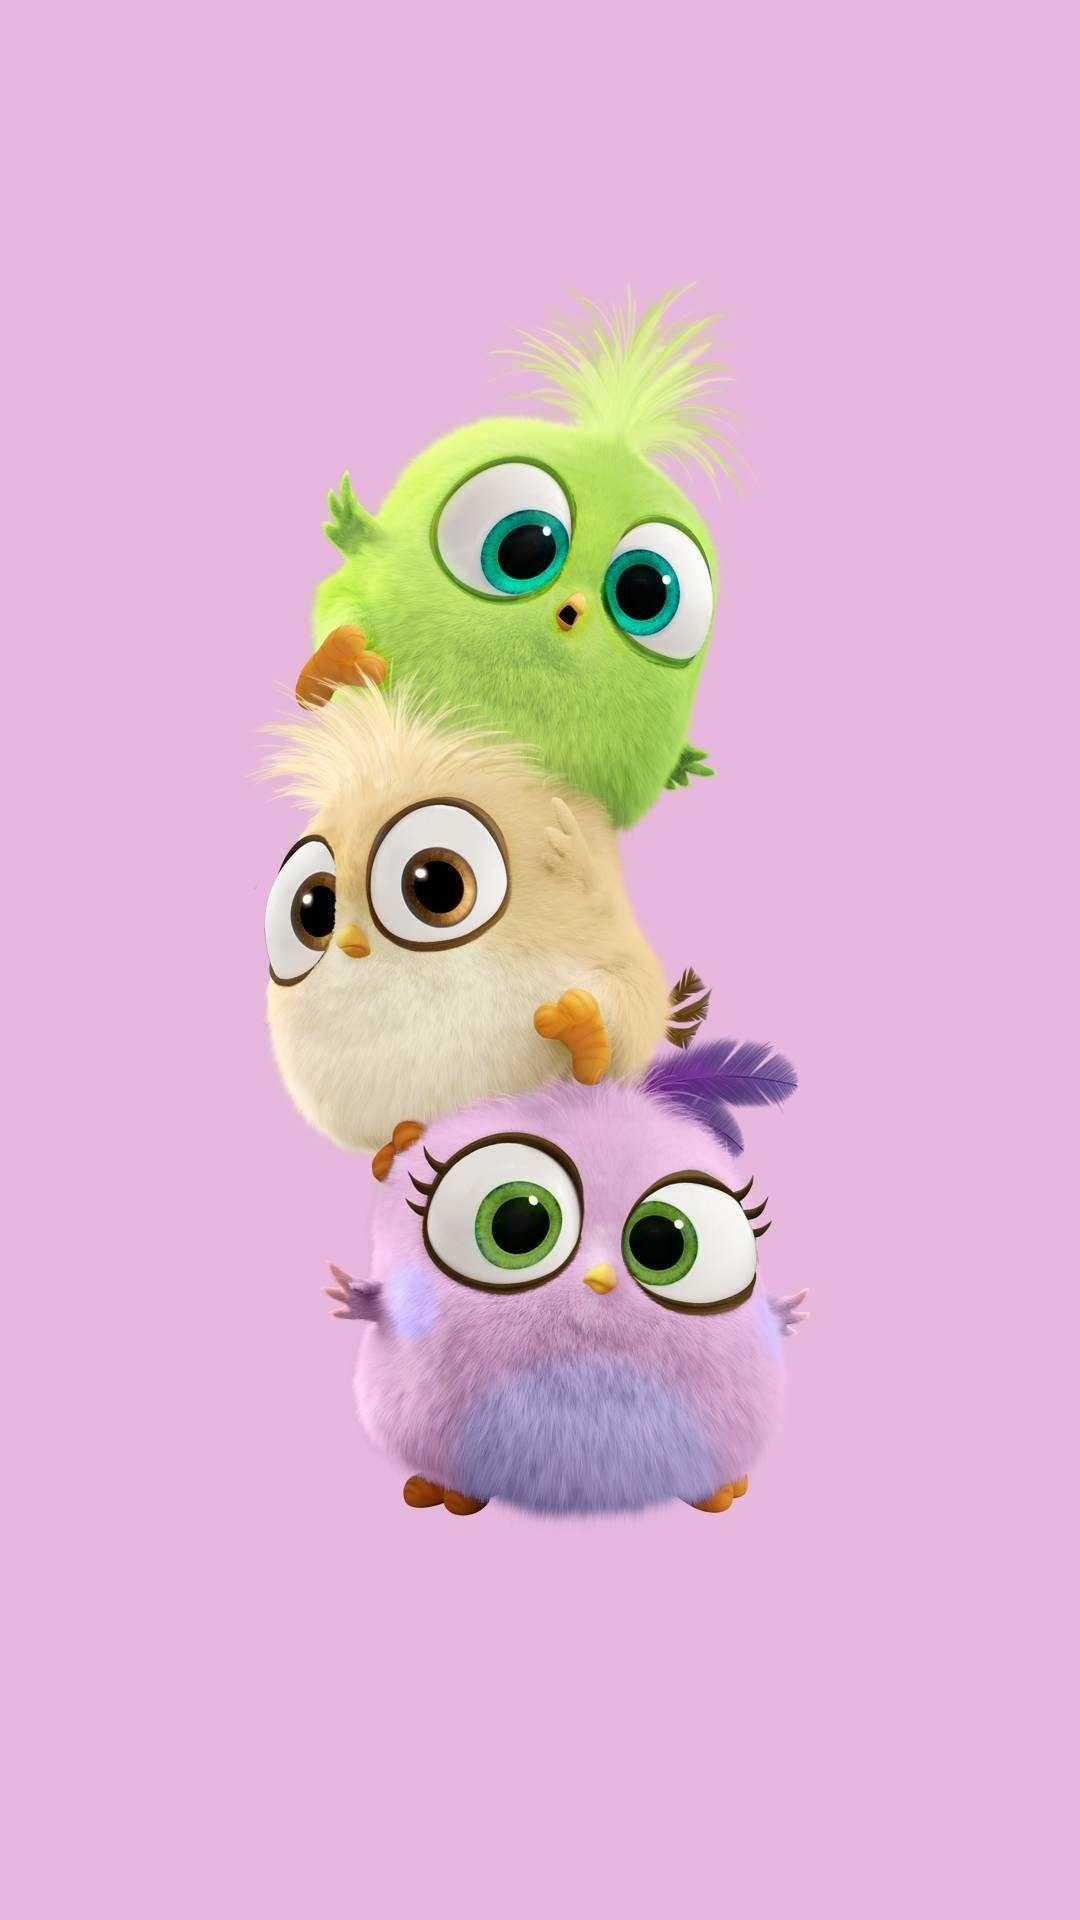 Angry Birds Movie Characters Android Wallpaper Carteles De Peliculas De Disney Wallpapers En Hd Poster De Peliculas